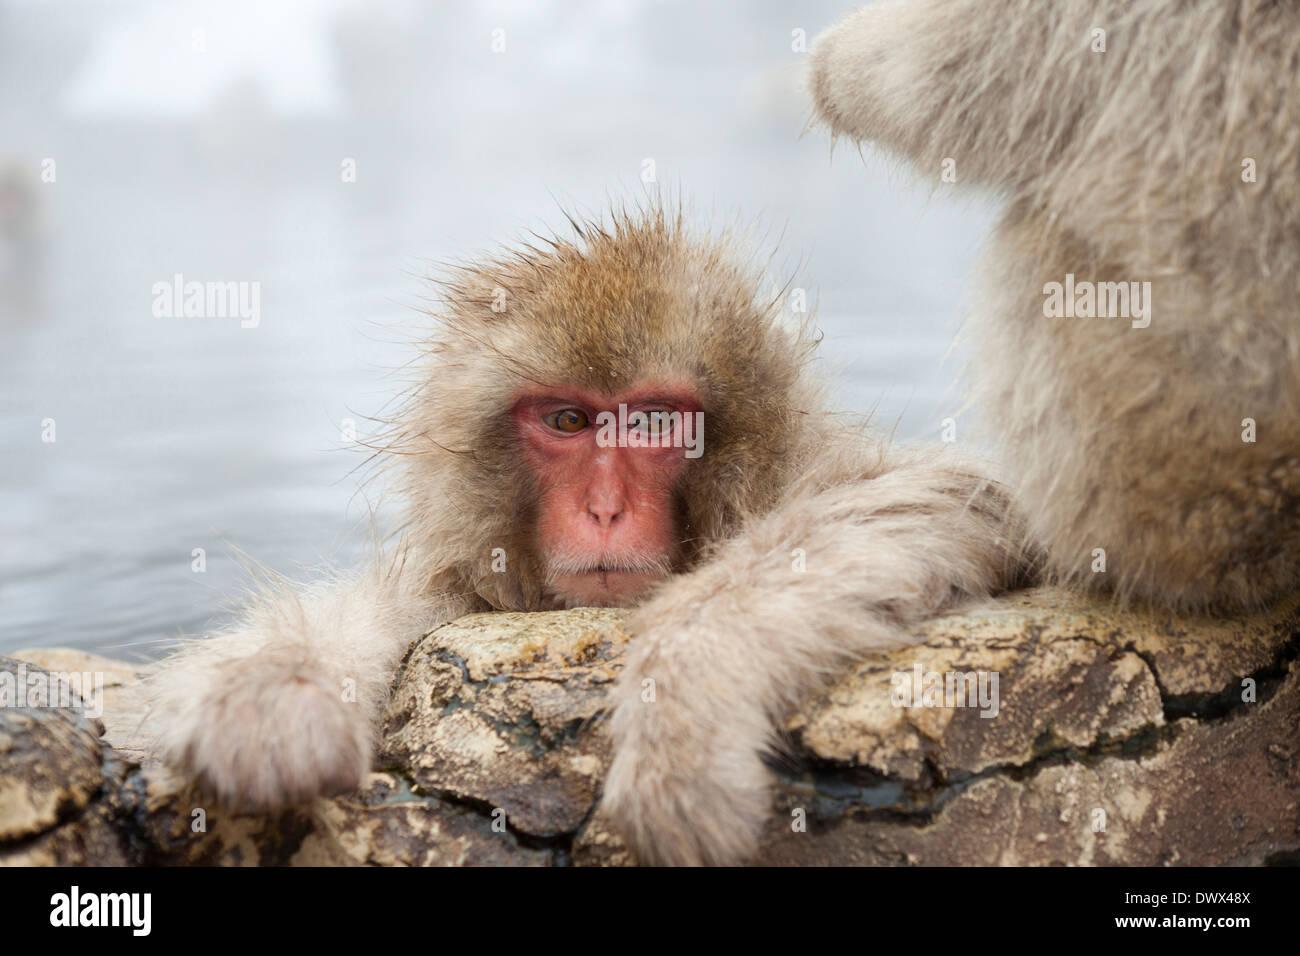 Japanese macaques in hot spring, Nagano, Japan - Stock Image